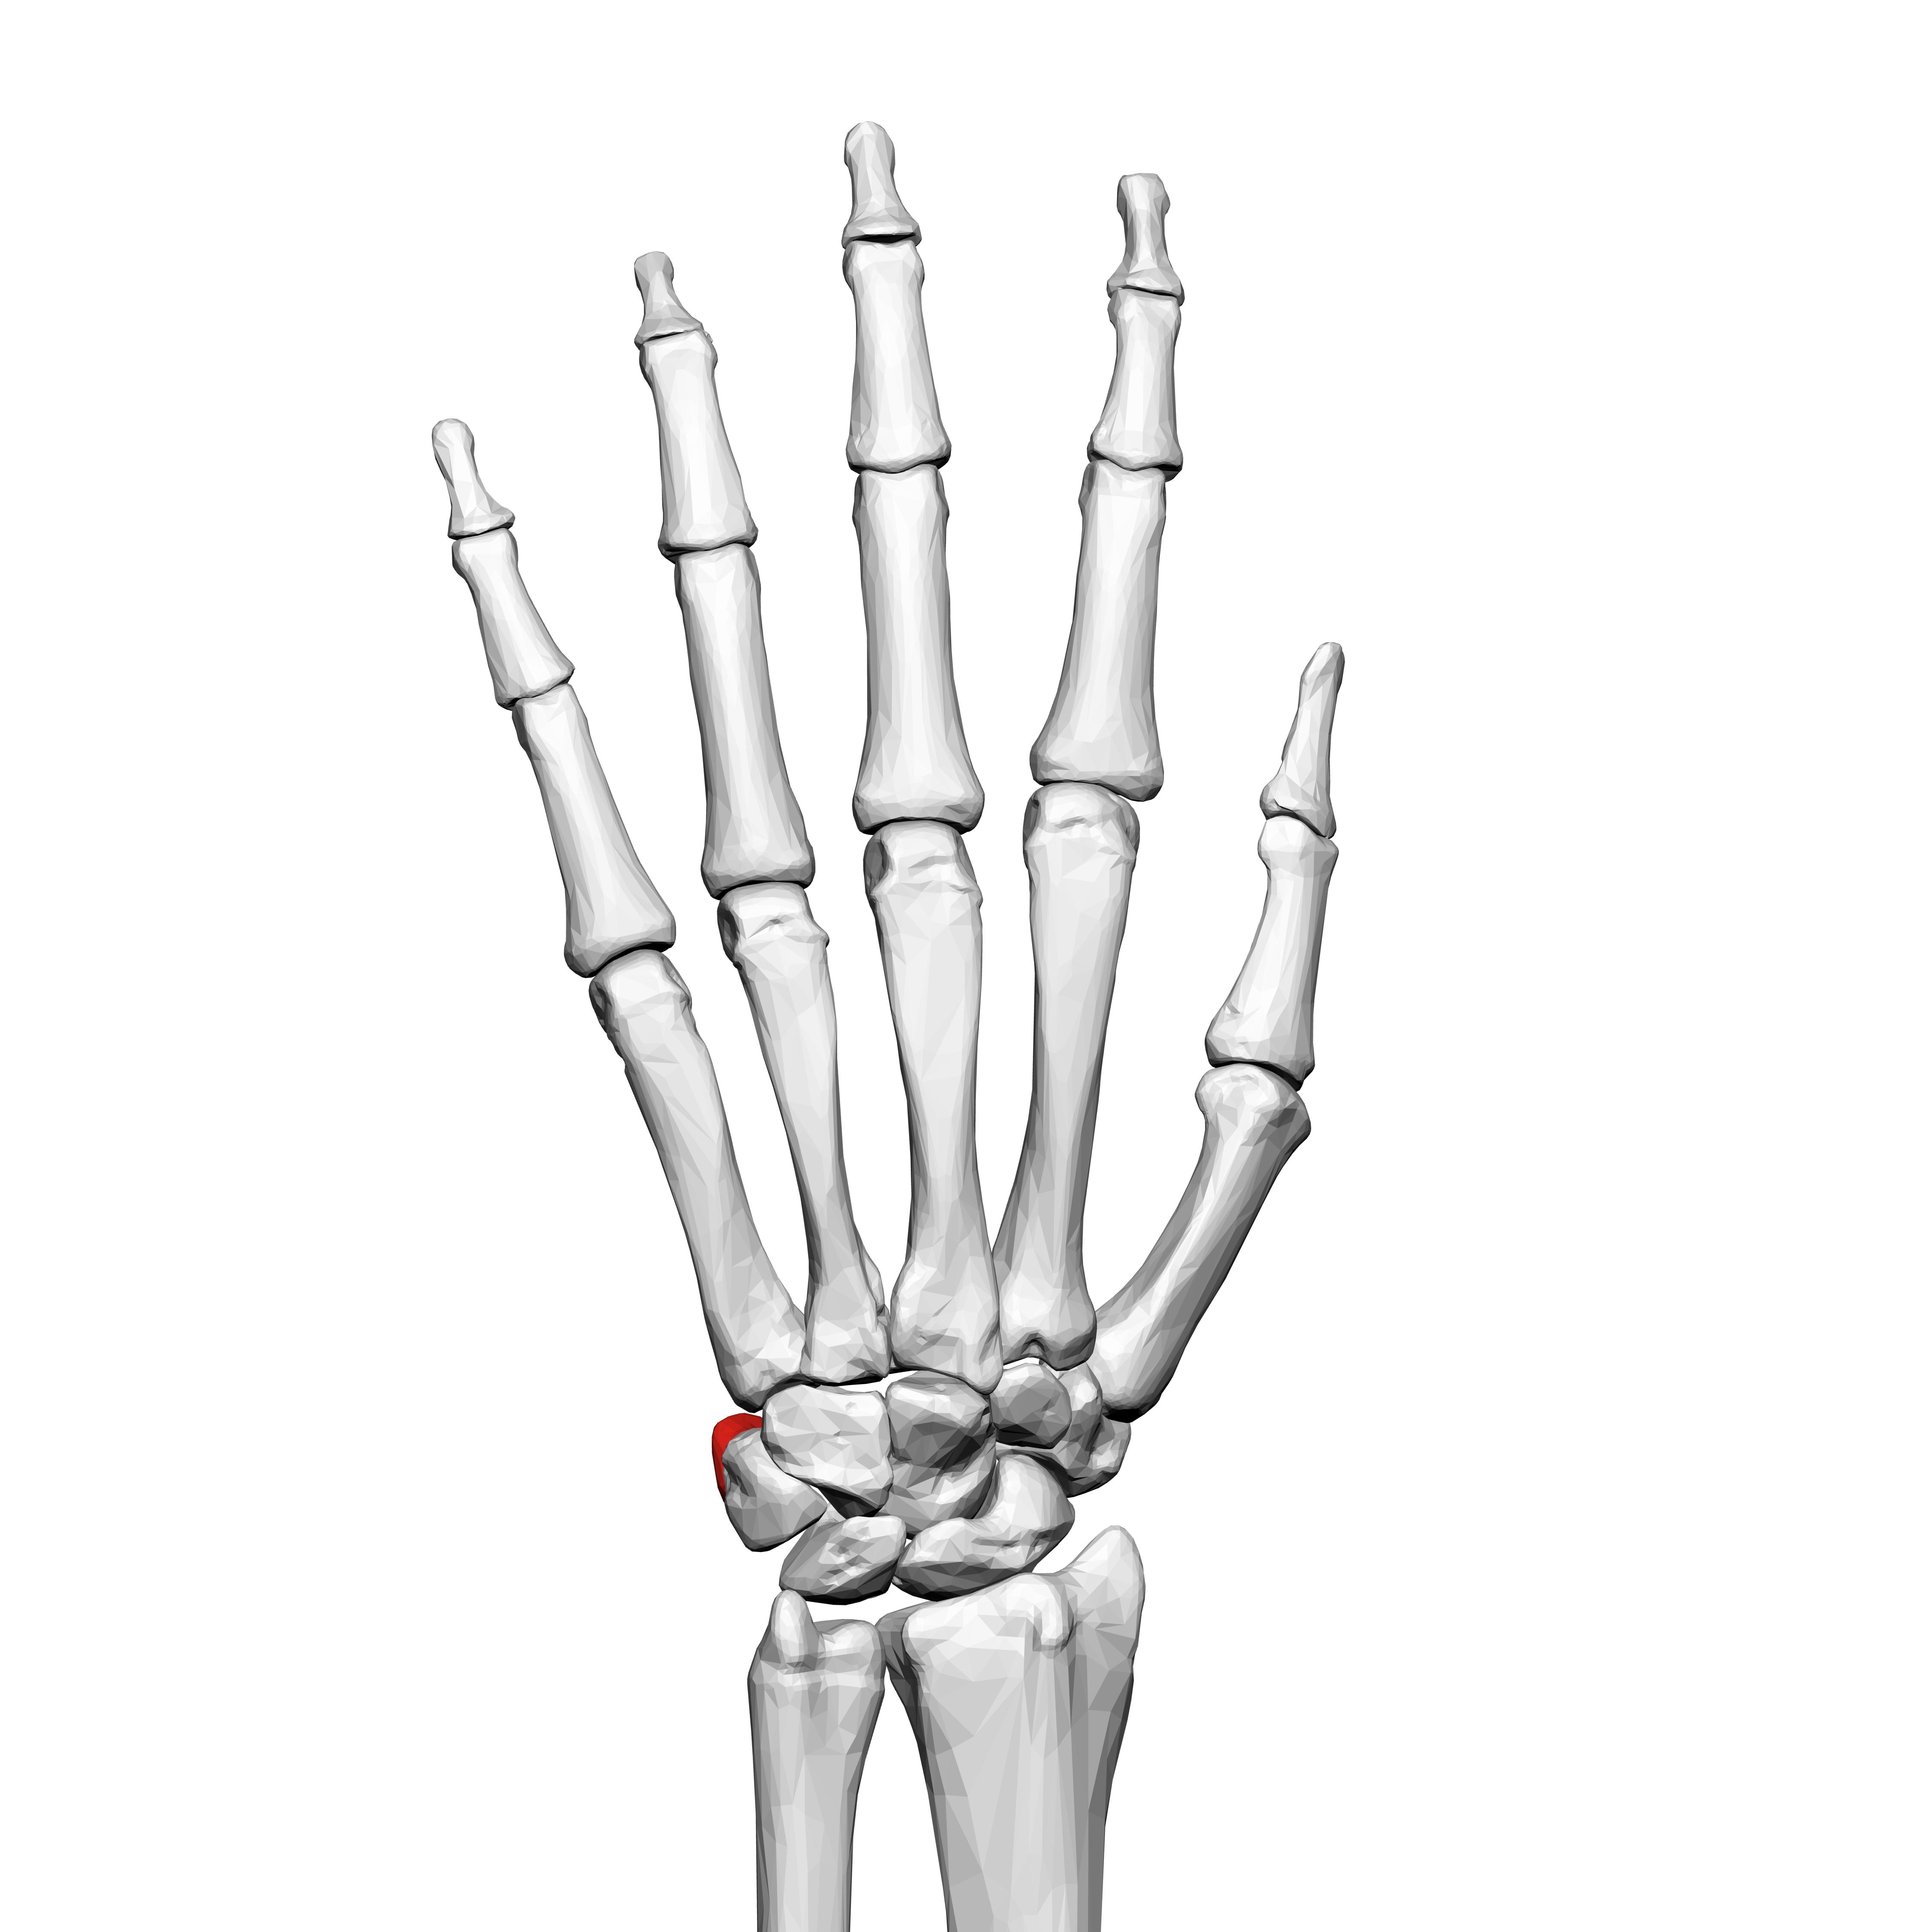 File:Pisiform bone (left hand) 02 dorsal view.png - Wikimedia Commons